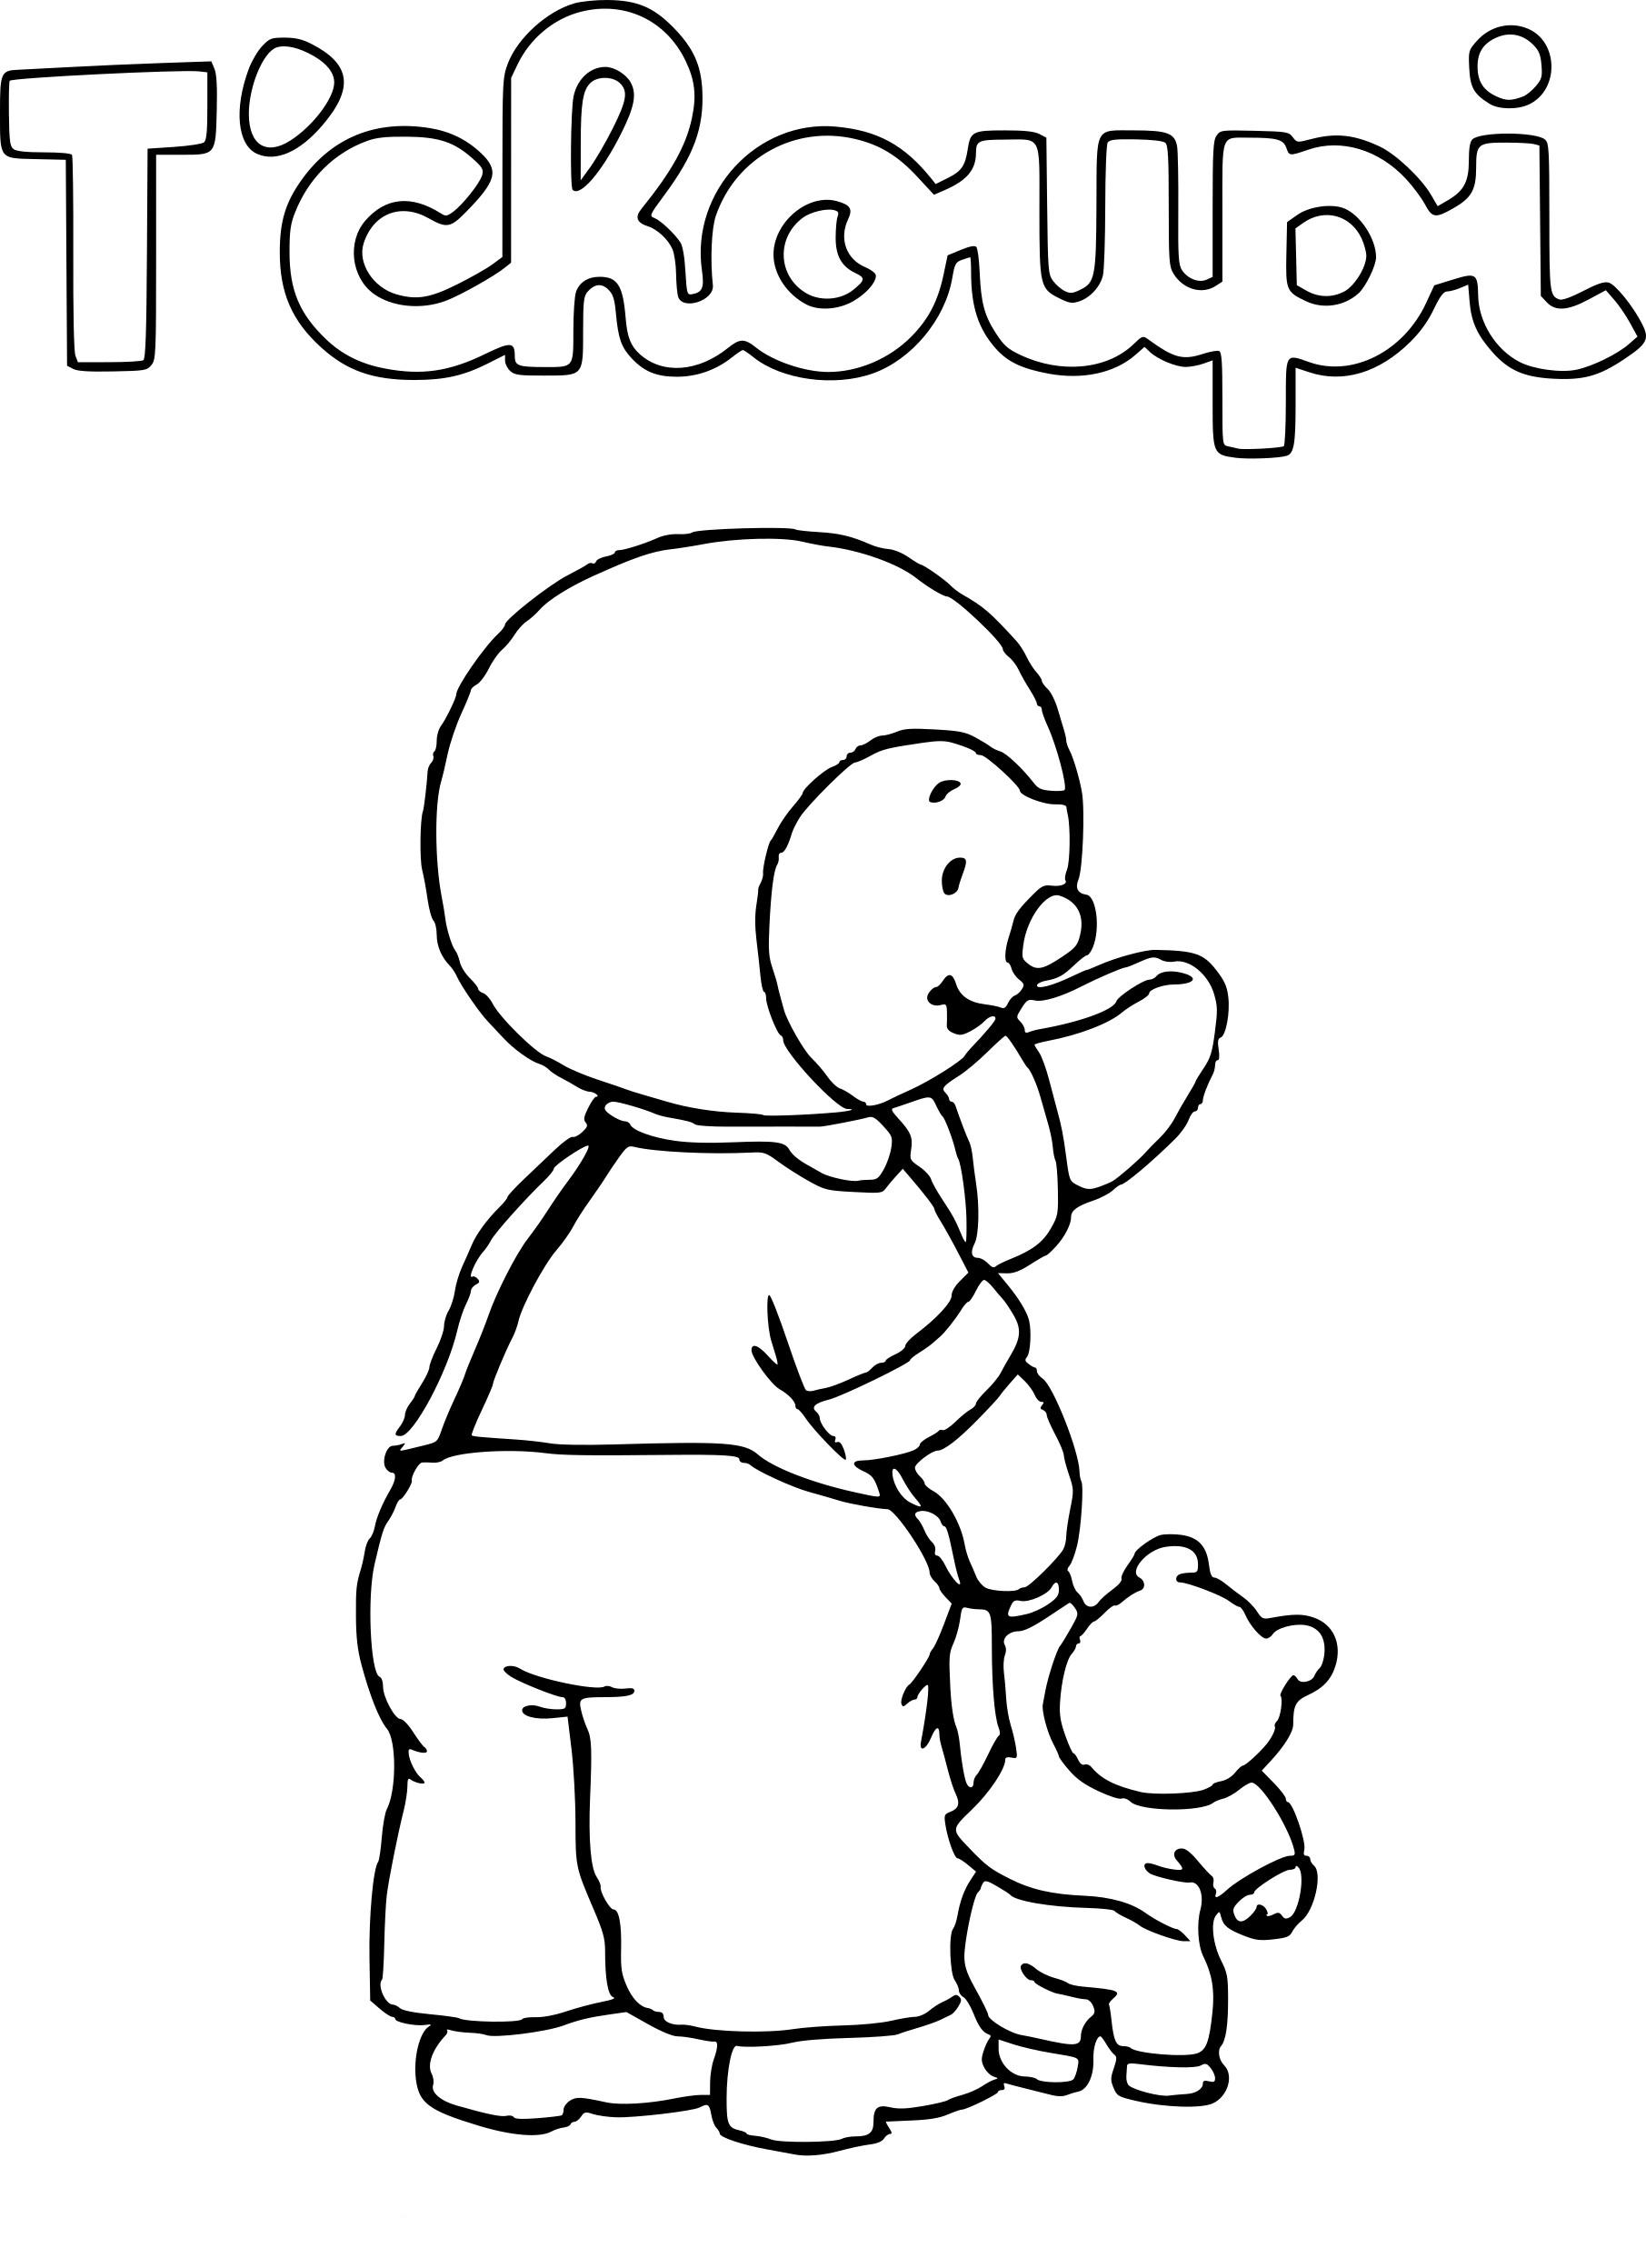 Coloriage Garfield A Imprimer